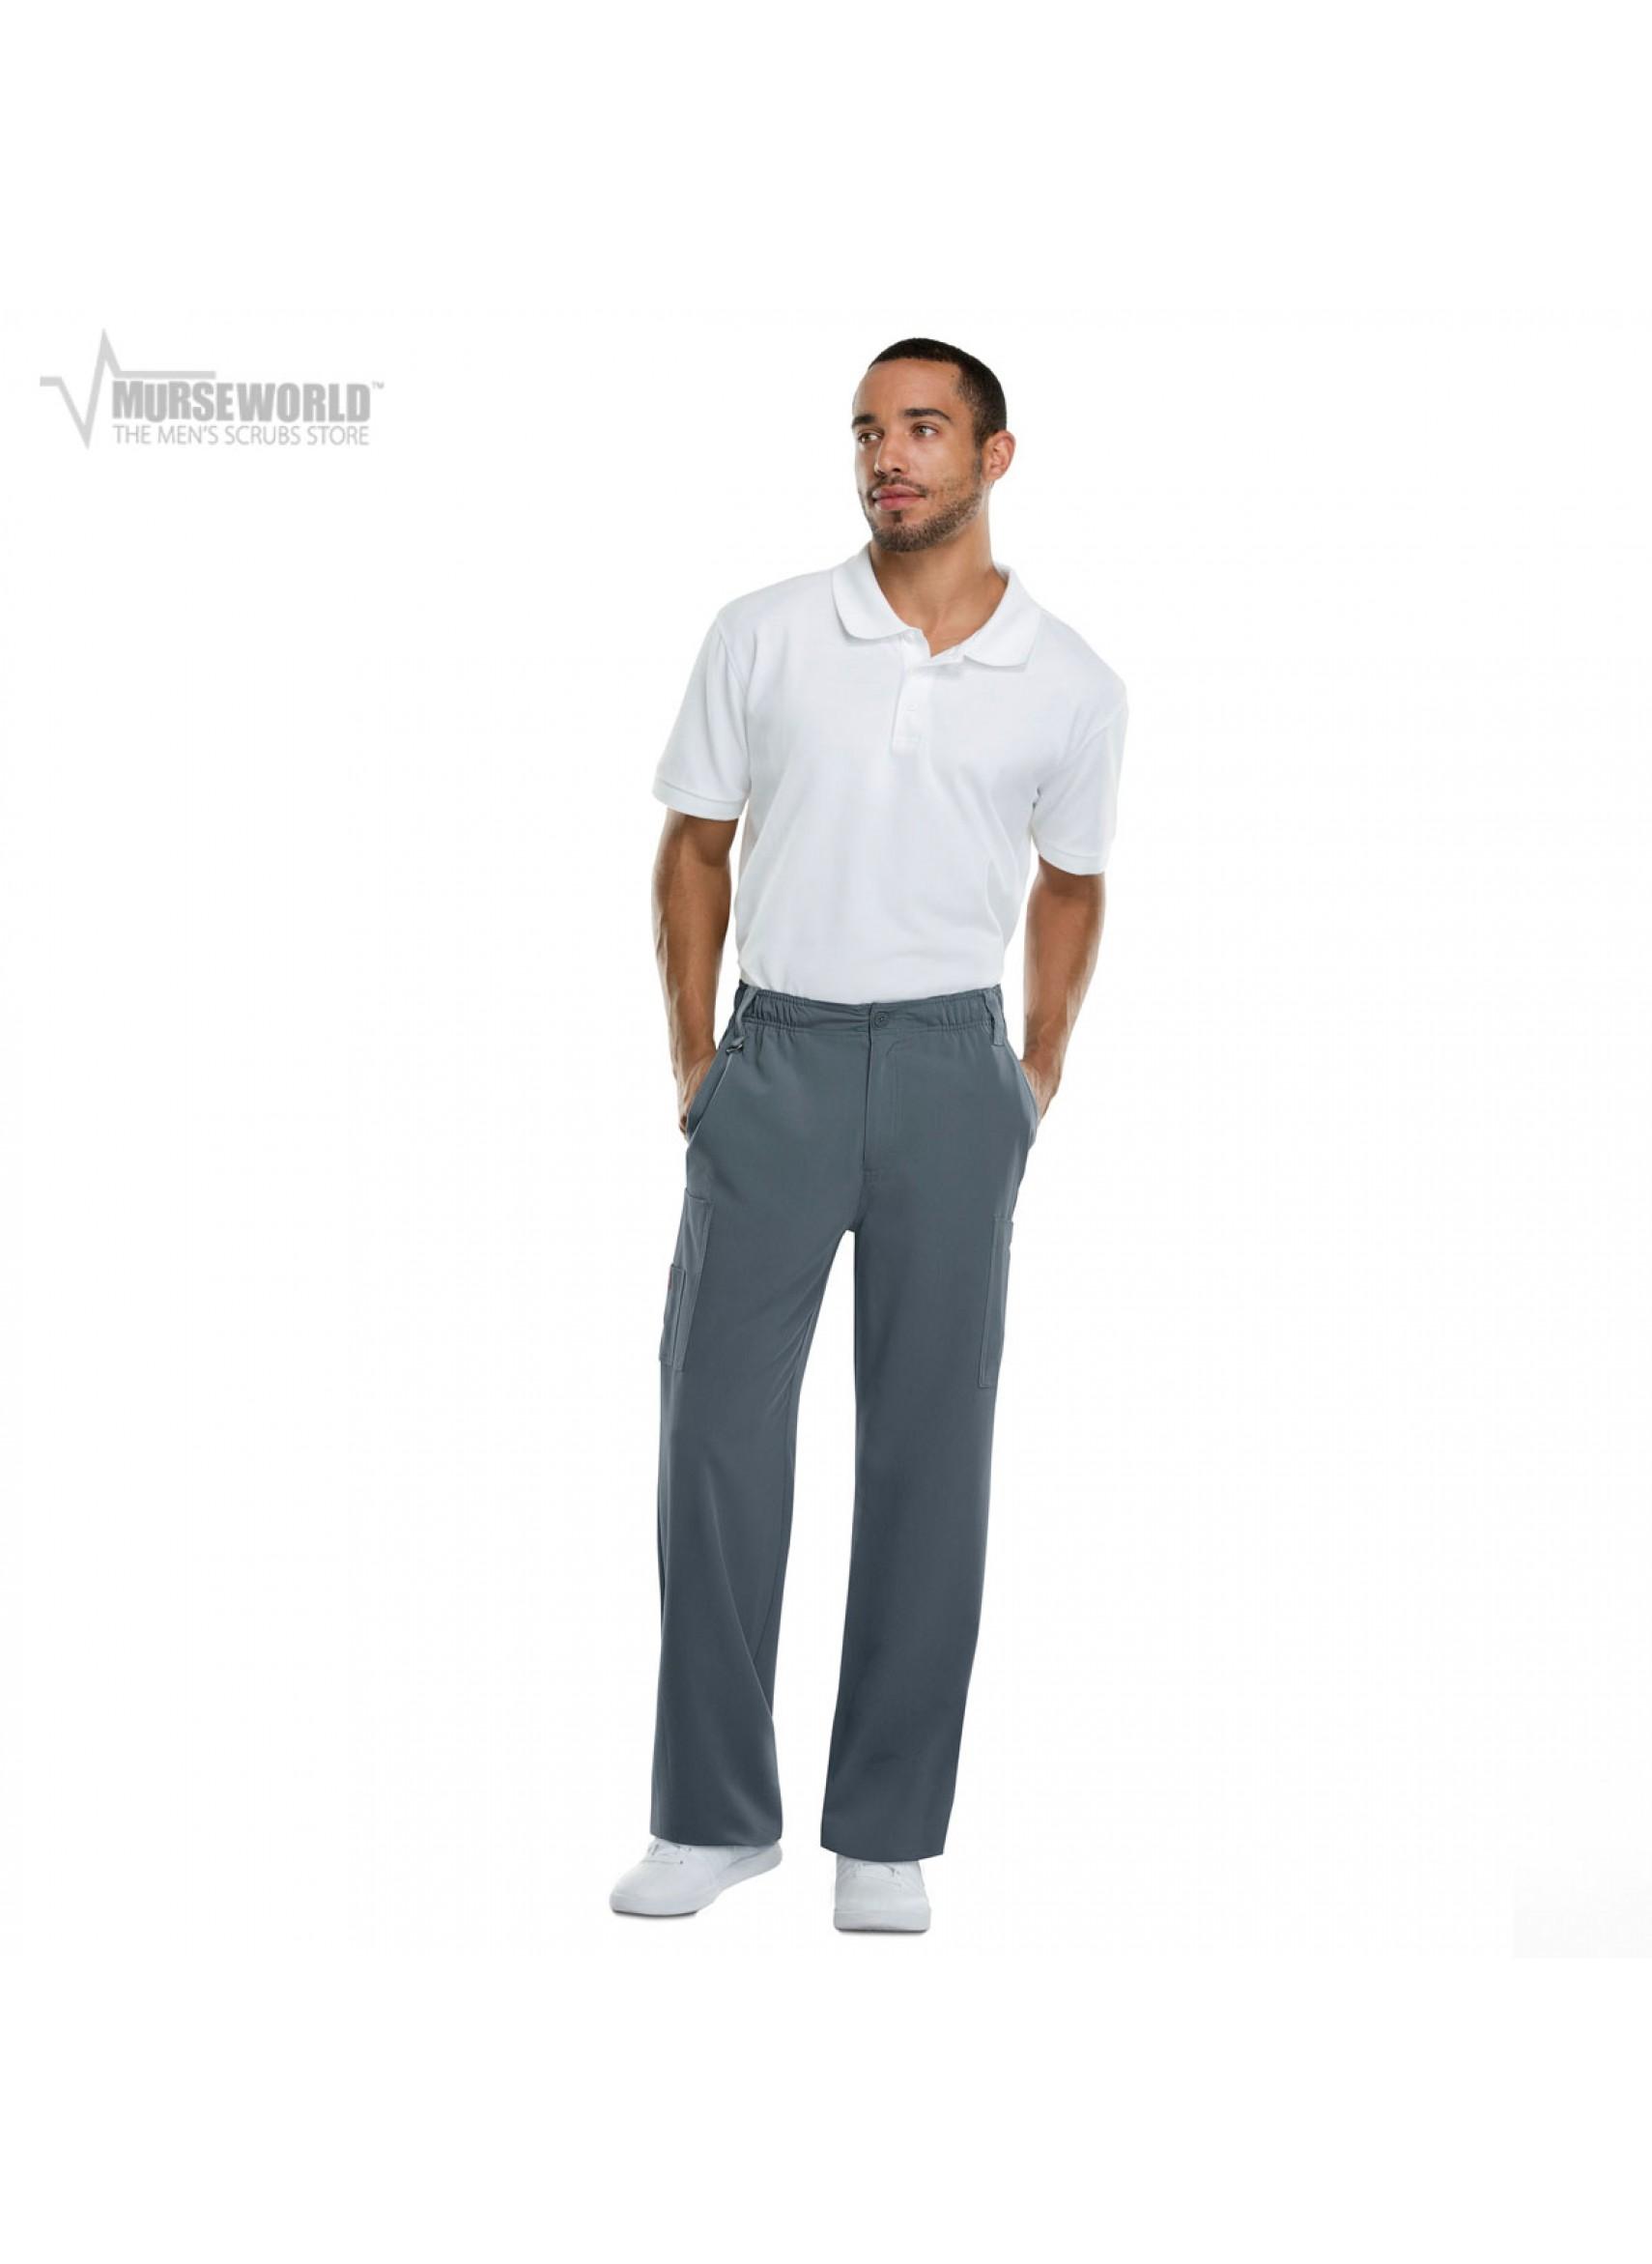 27c2f86fd1 Dickies Xtreme Stretch Men's Pull-on Scrub Pant - 81210 | Murse World